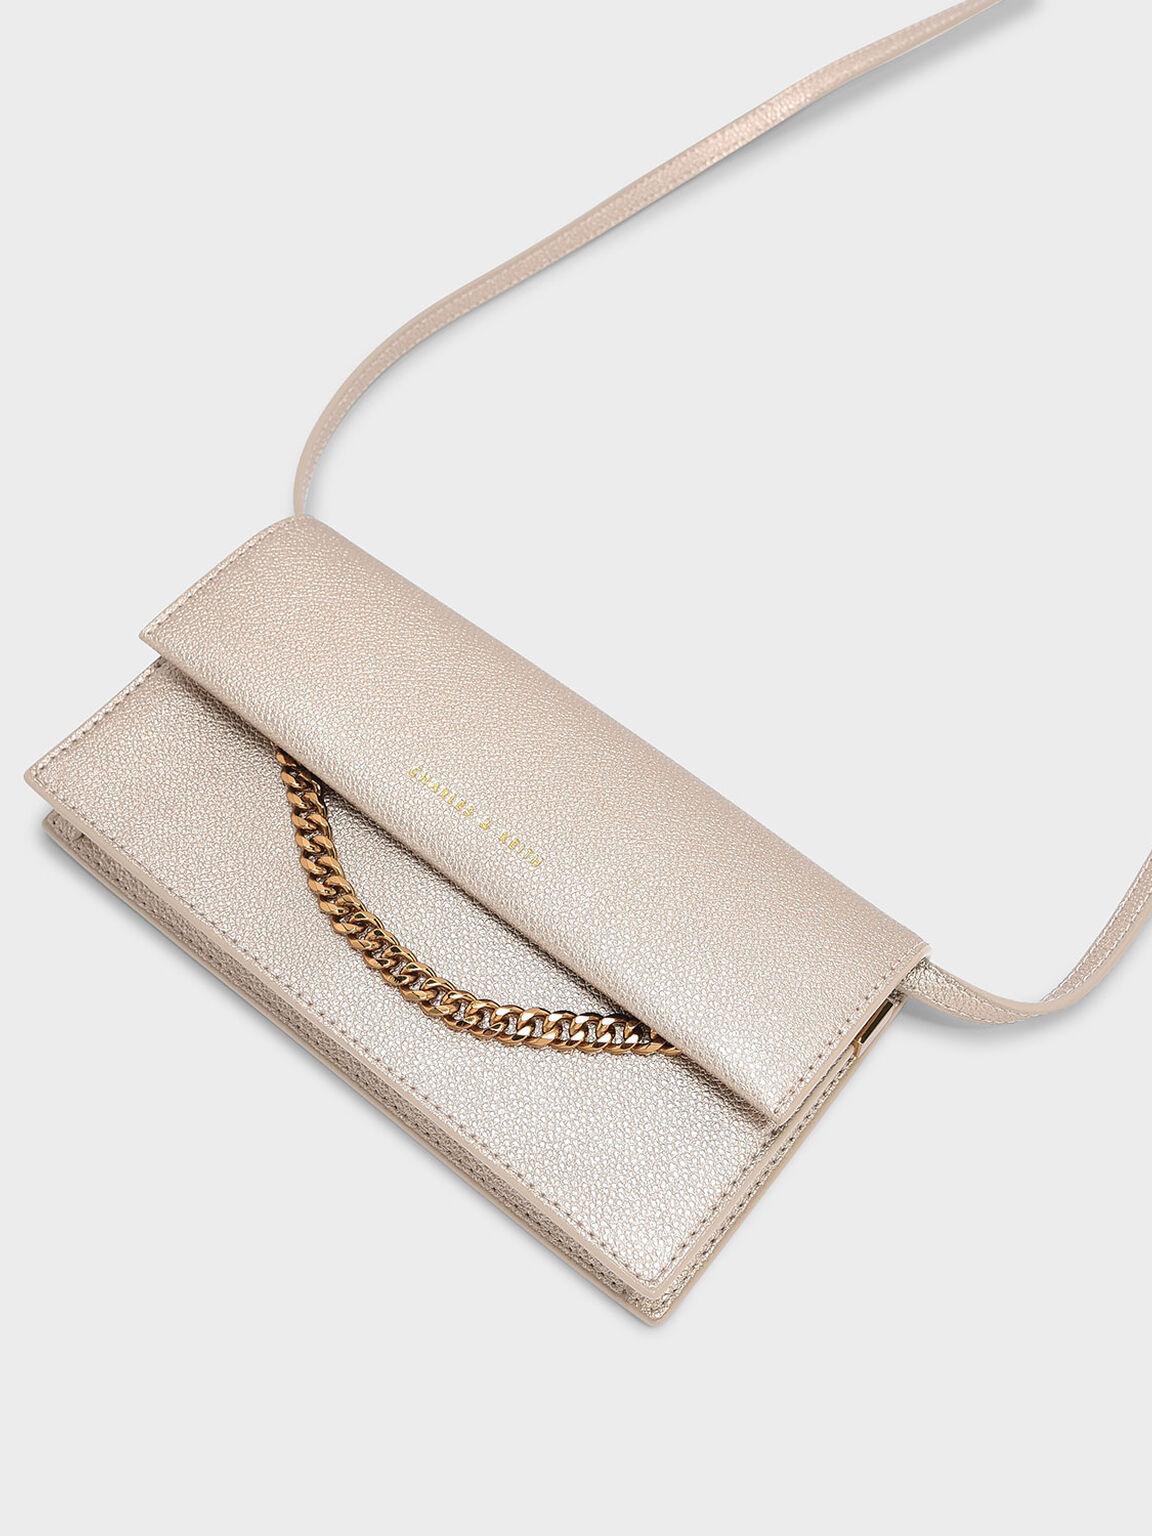 Chain Detail Wallet, Rose Gold, hi-res